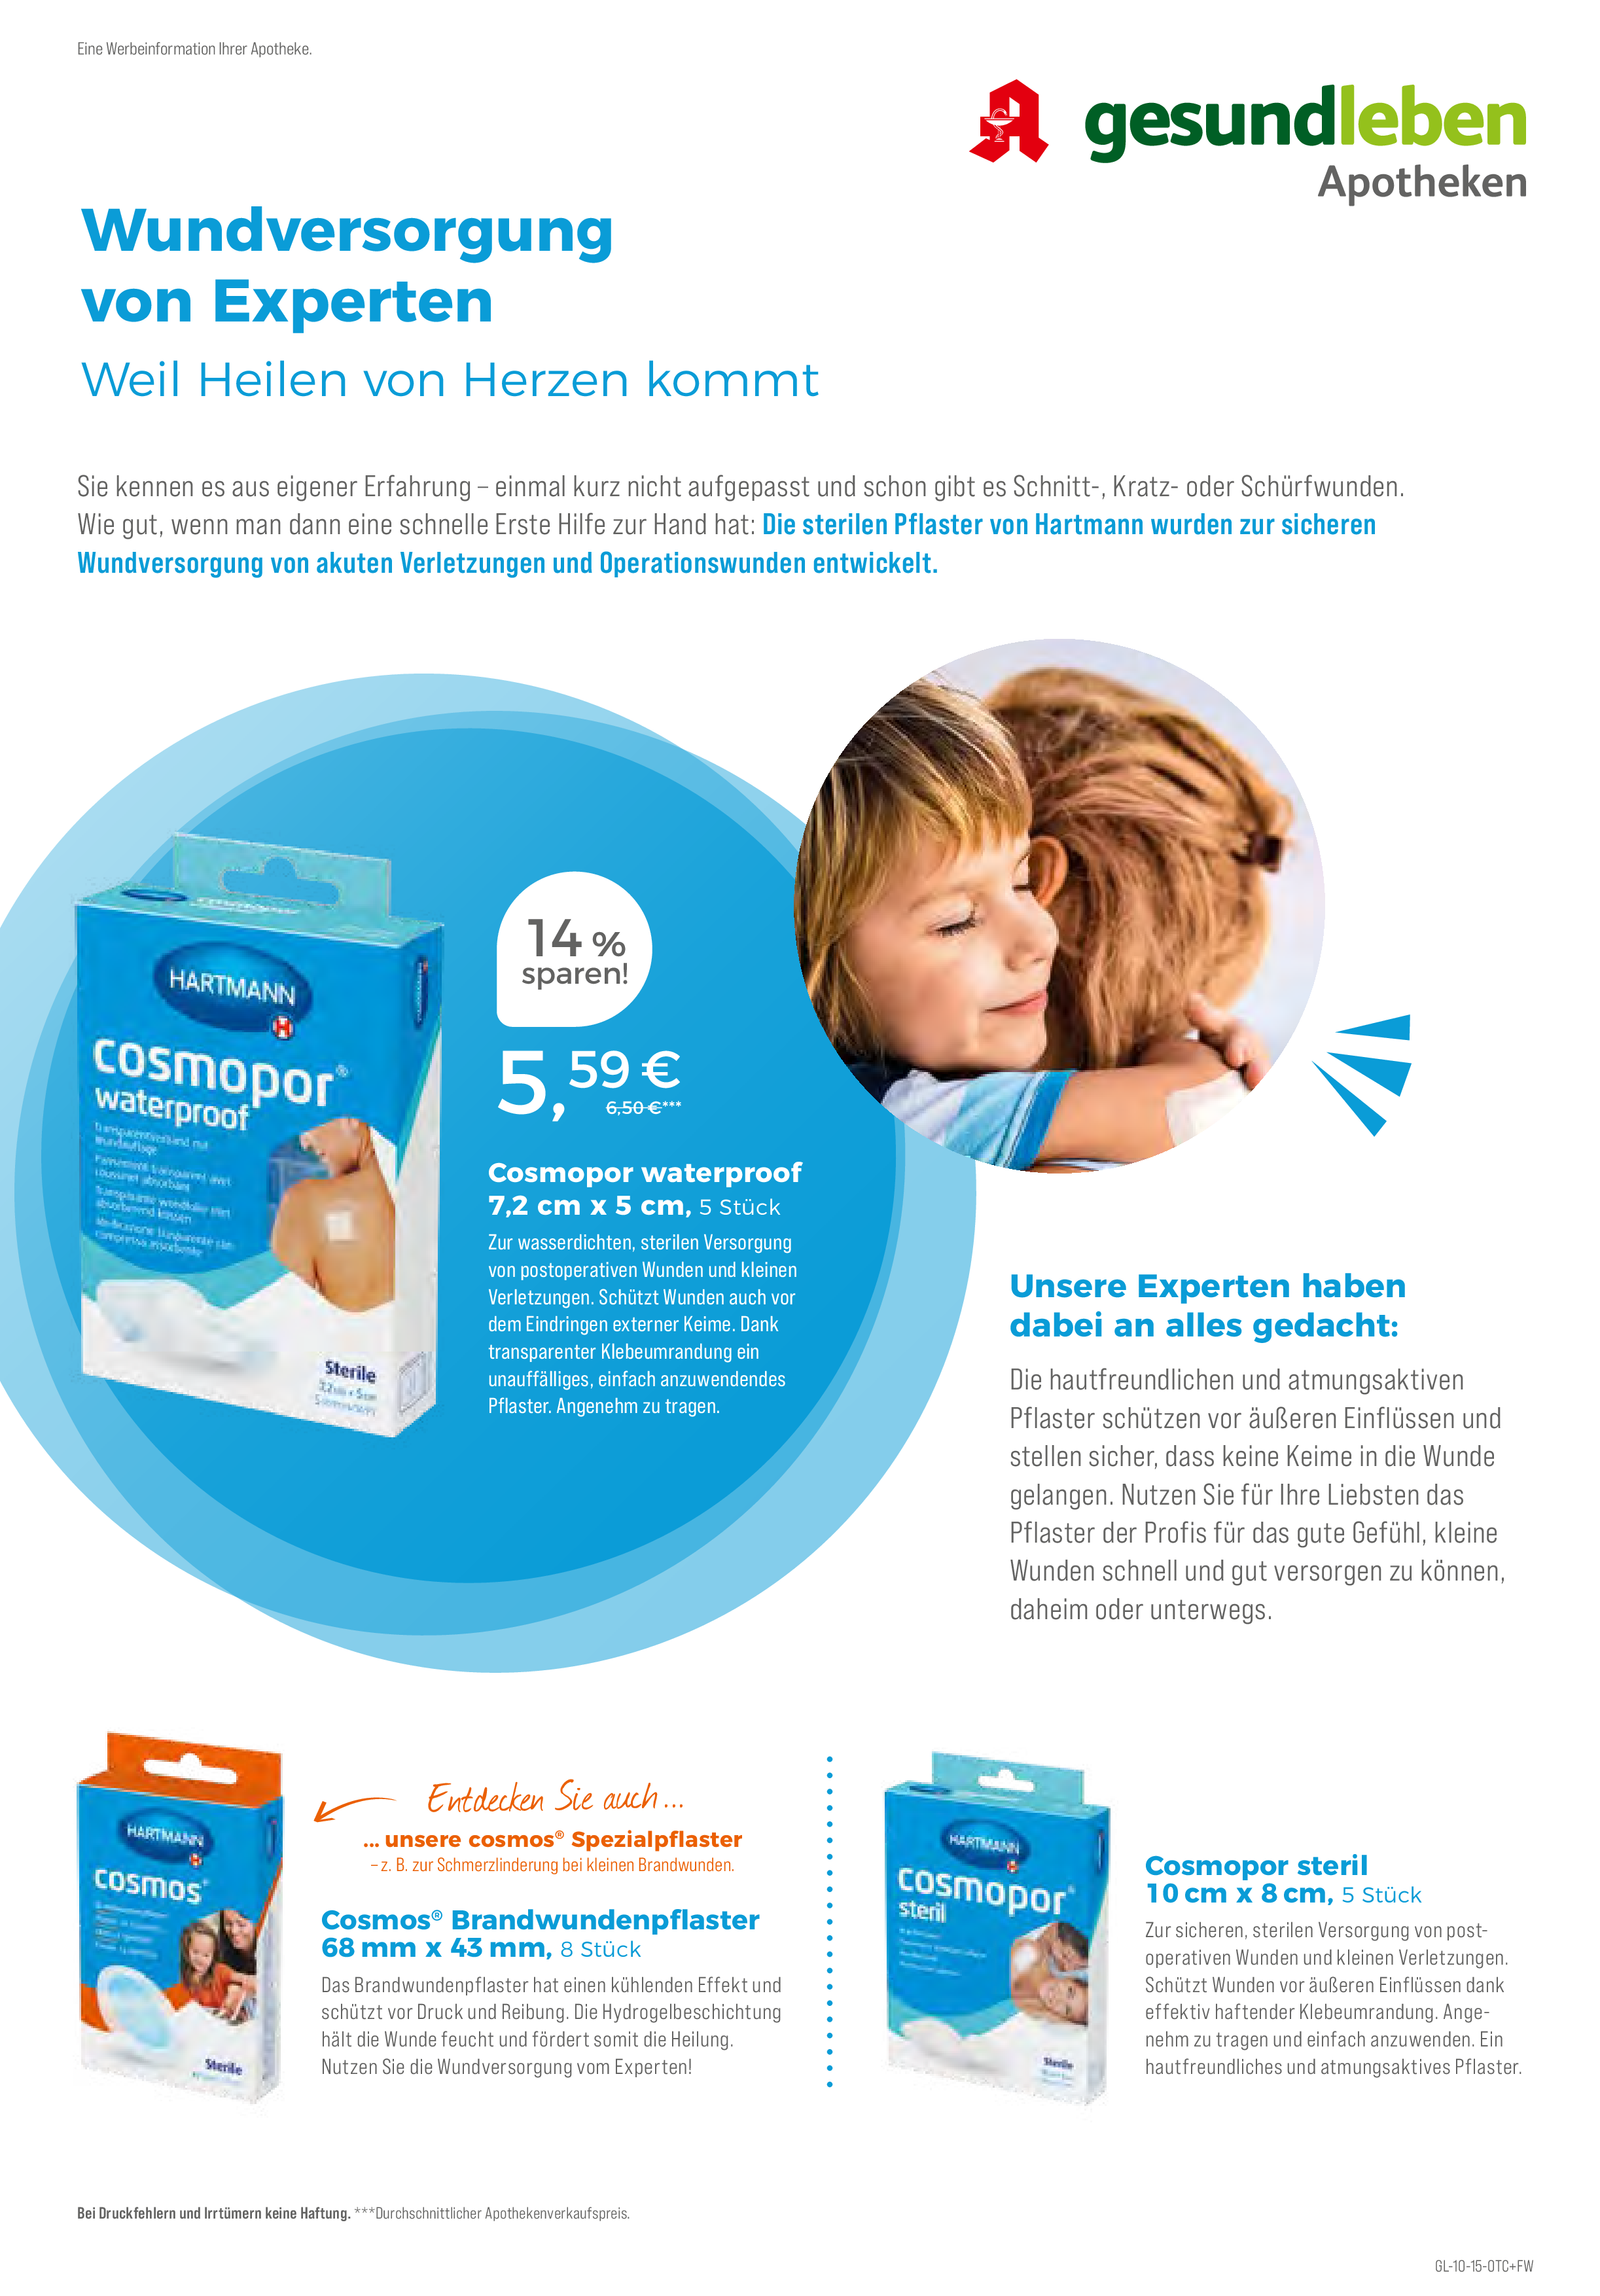 https://mein-uploads.apocdn.net/26520/leaflets/gesundleben_niedrig-Seite5.png